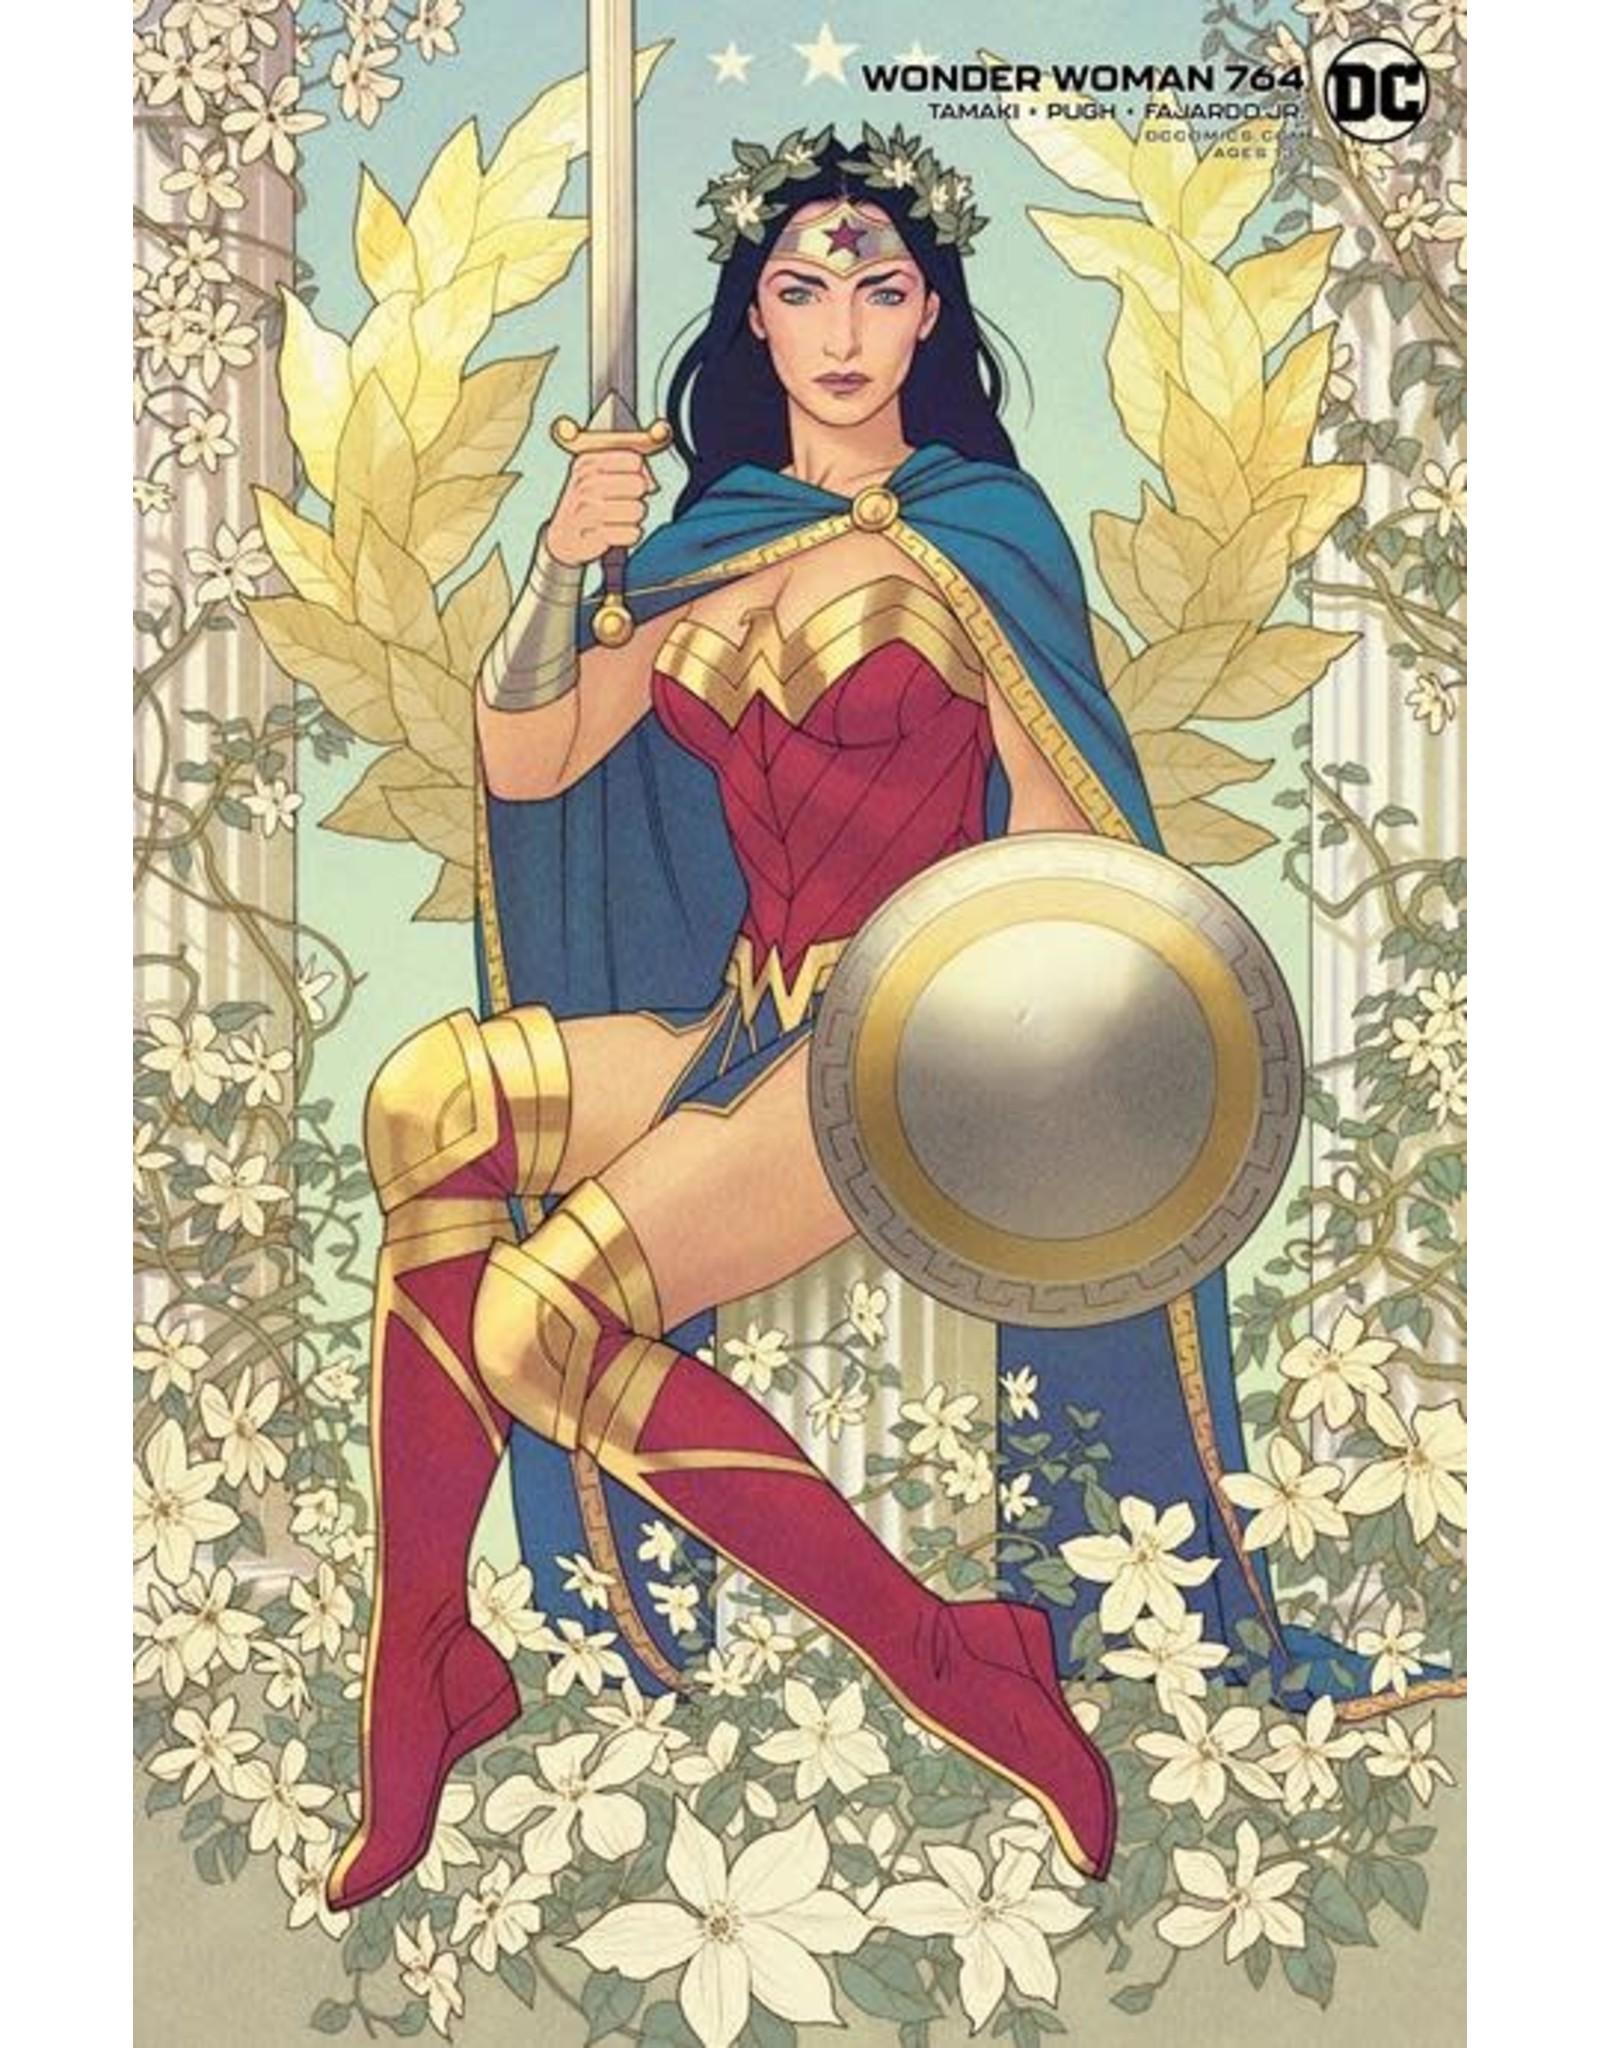 DC Comics WONDER WOMAN #764 CVR B JOSHUA MIDDLETON CARD STOCK VAR